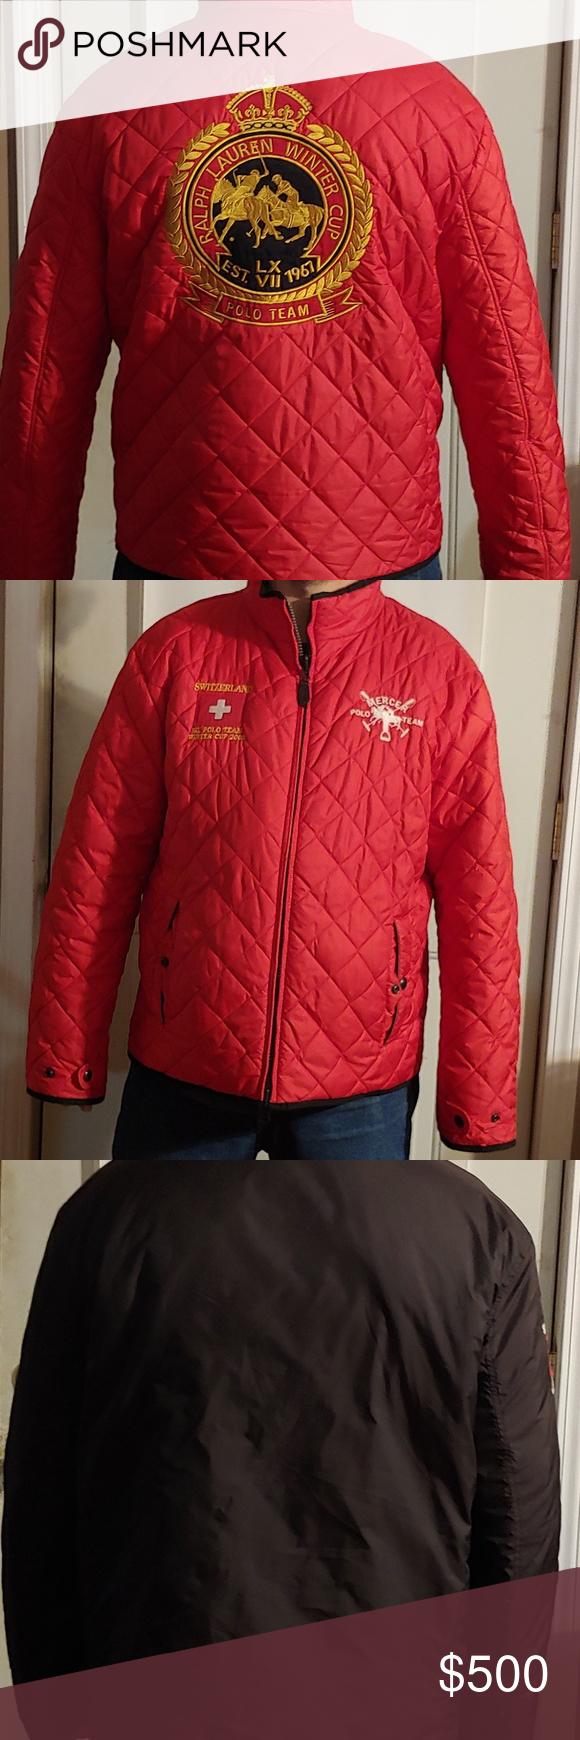 Rare Ralph Lauren 2008 Winter Cup Jacket Jackets Ralph Lauren Jackets Ralph Lauren [ 1740 x 580 Pixel ]